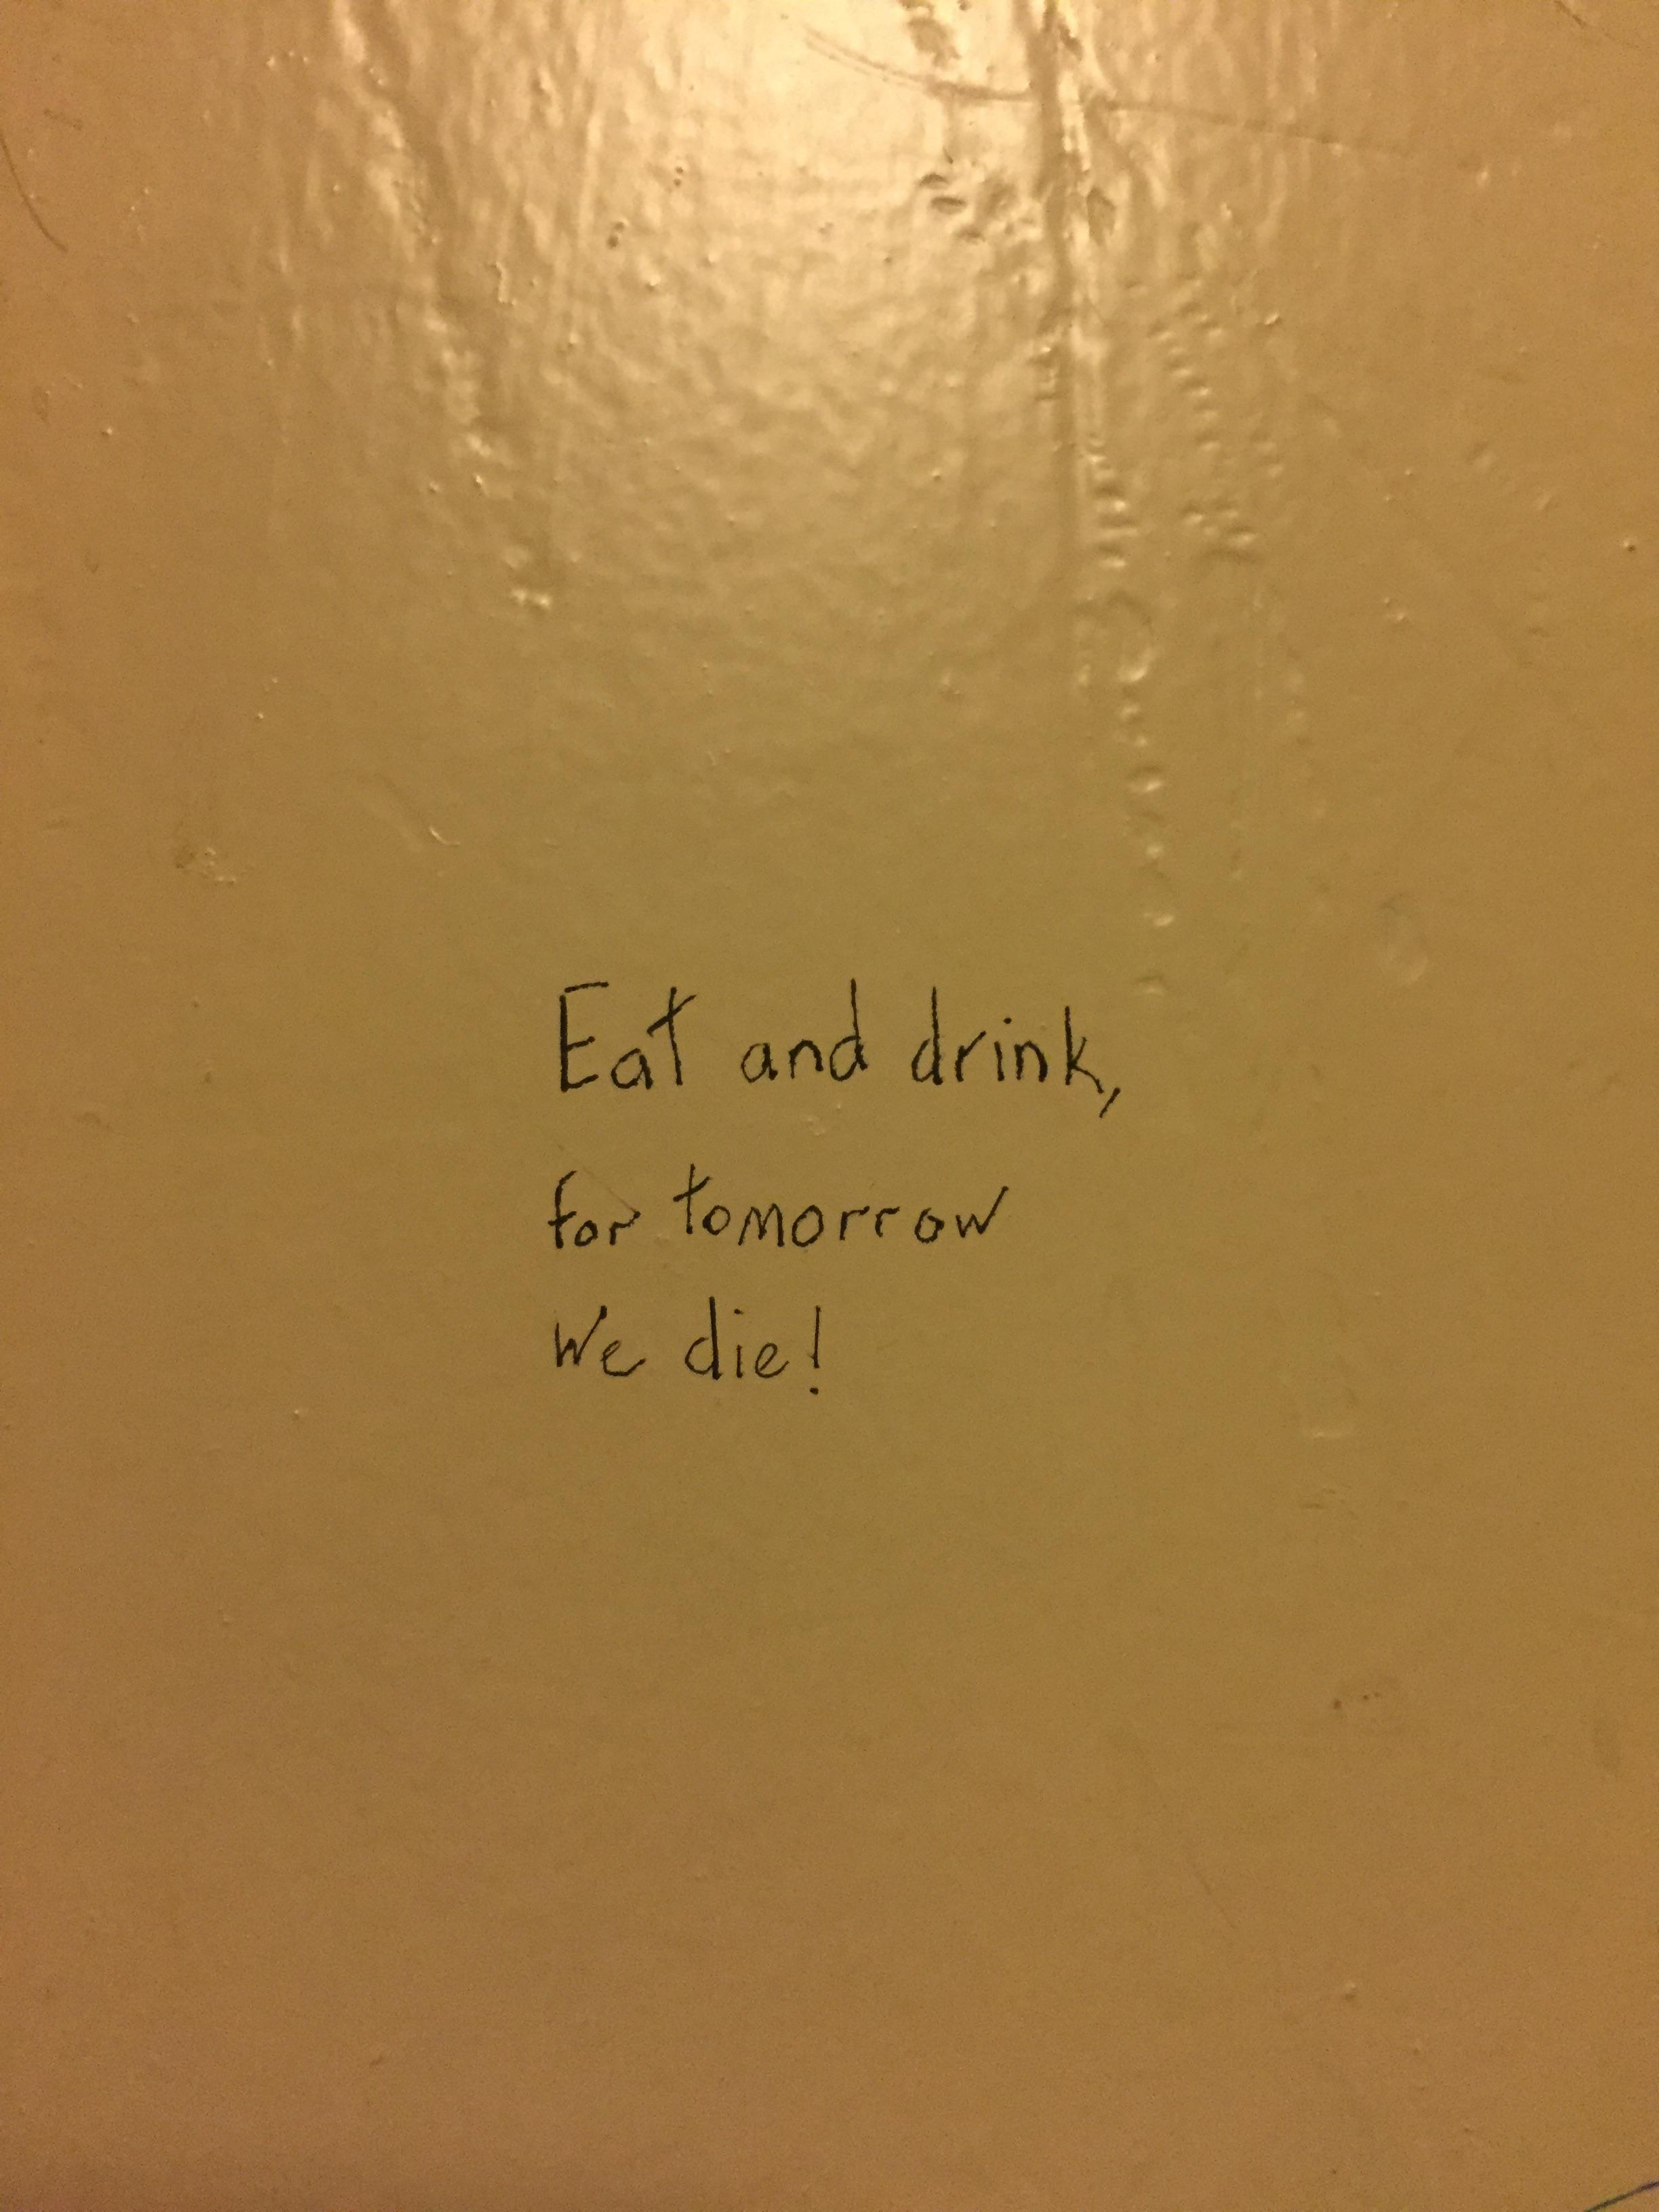 [image] Toilet stall pep talk